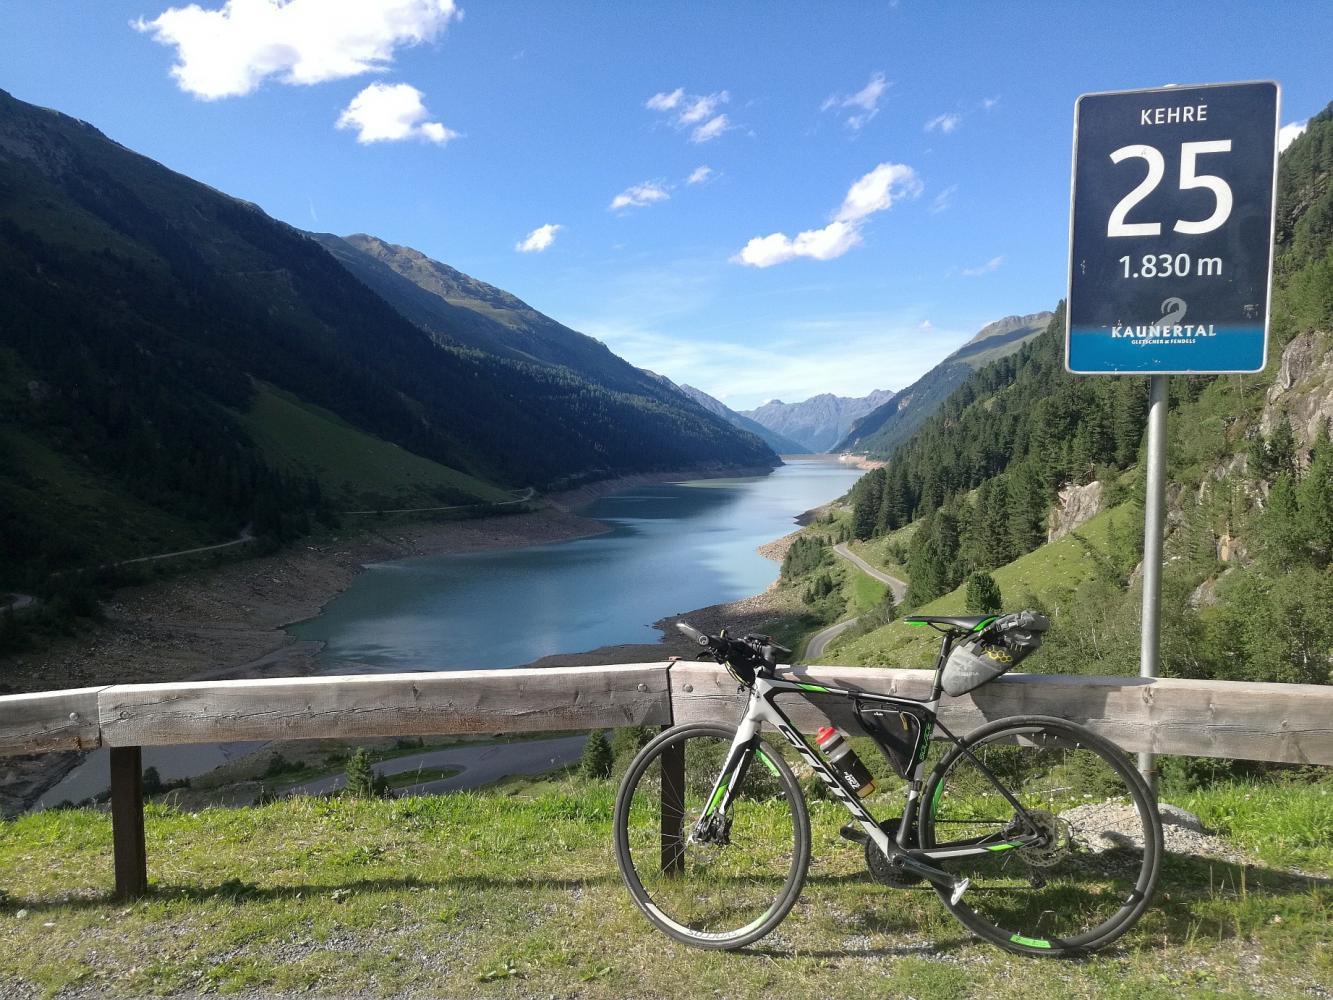 Kauntertal Gletscher Bike Climb - PJAMM Cycling